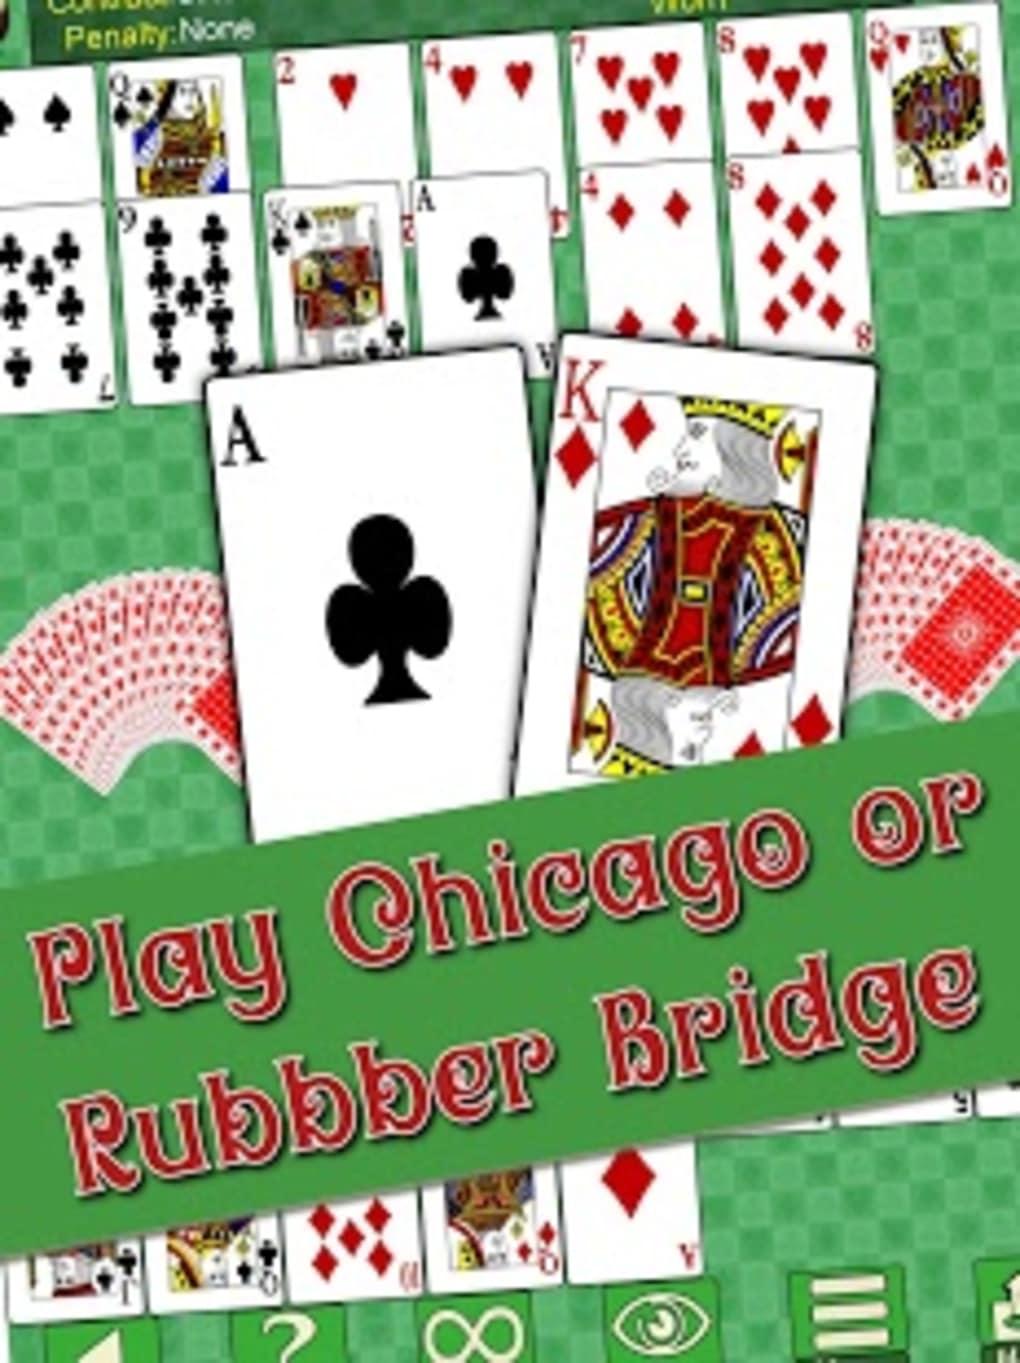 Omar Sharif Bridge 2018 Edition